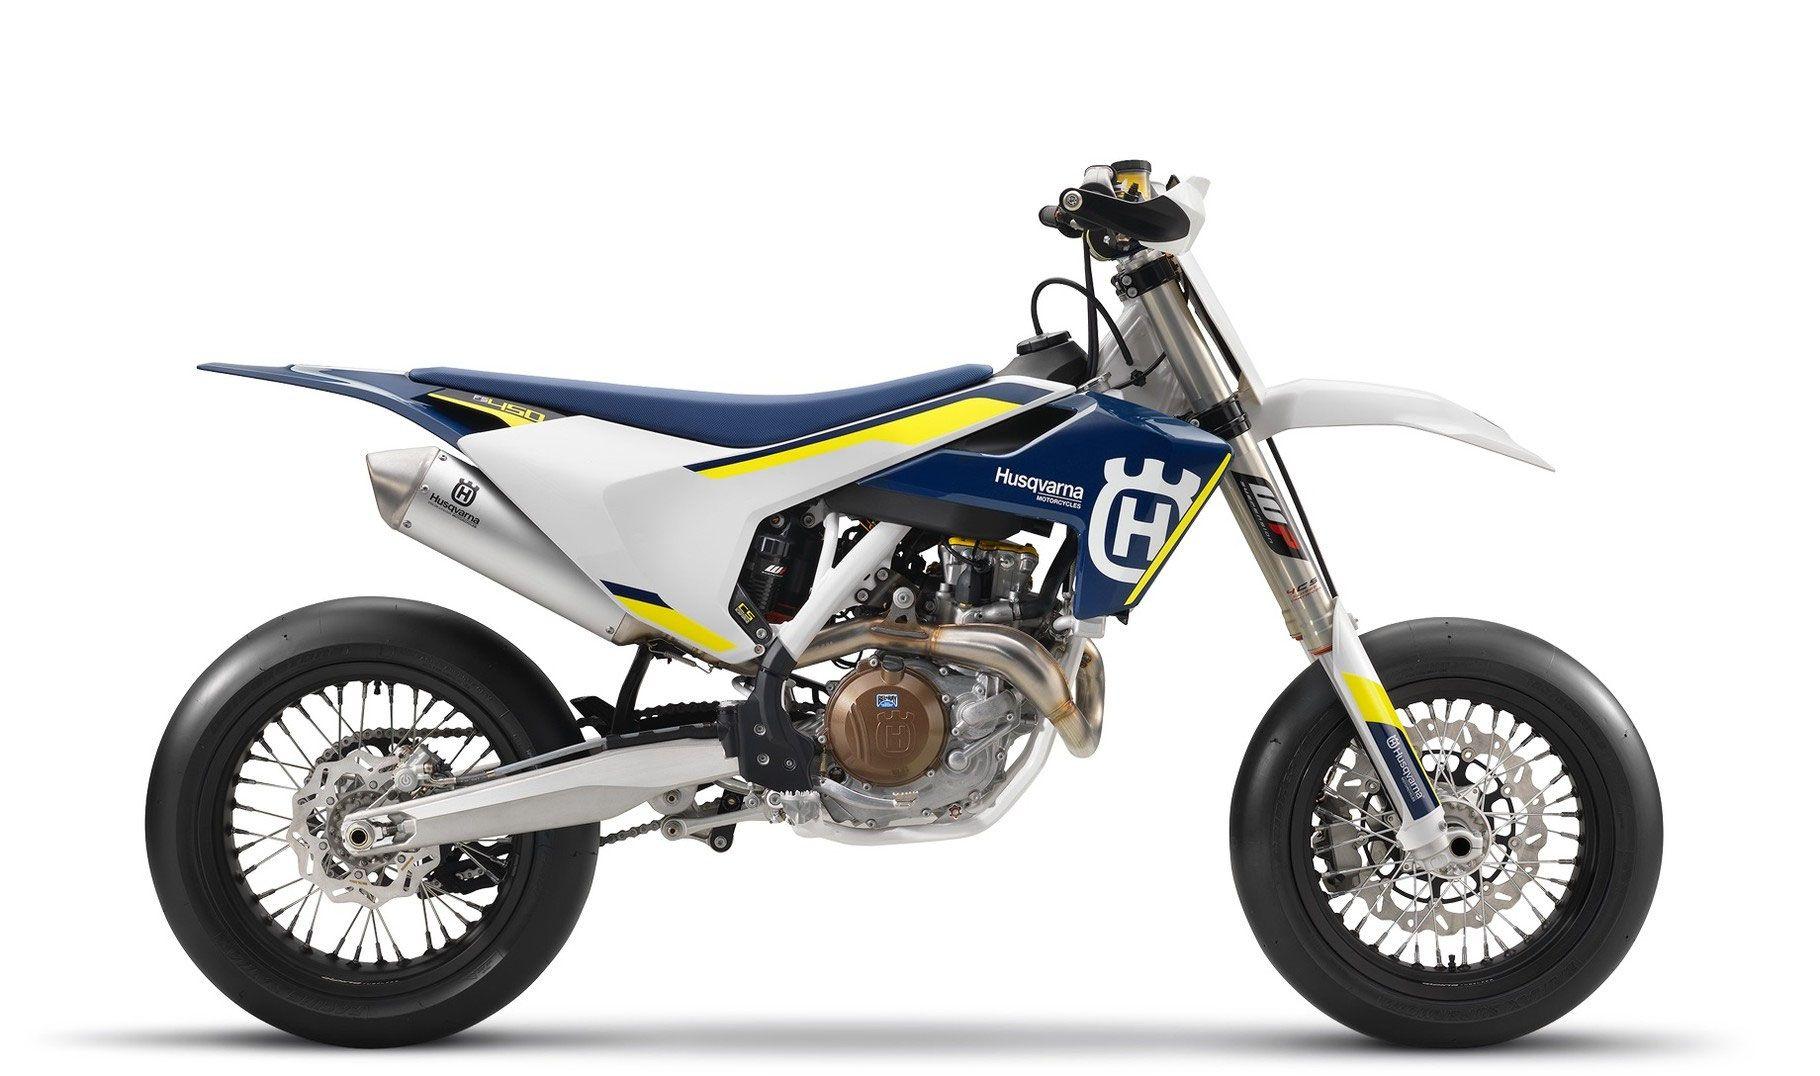 Husqvarna FS450 Supermoto Husqvarna Motorcycles had a